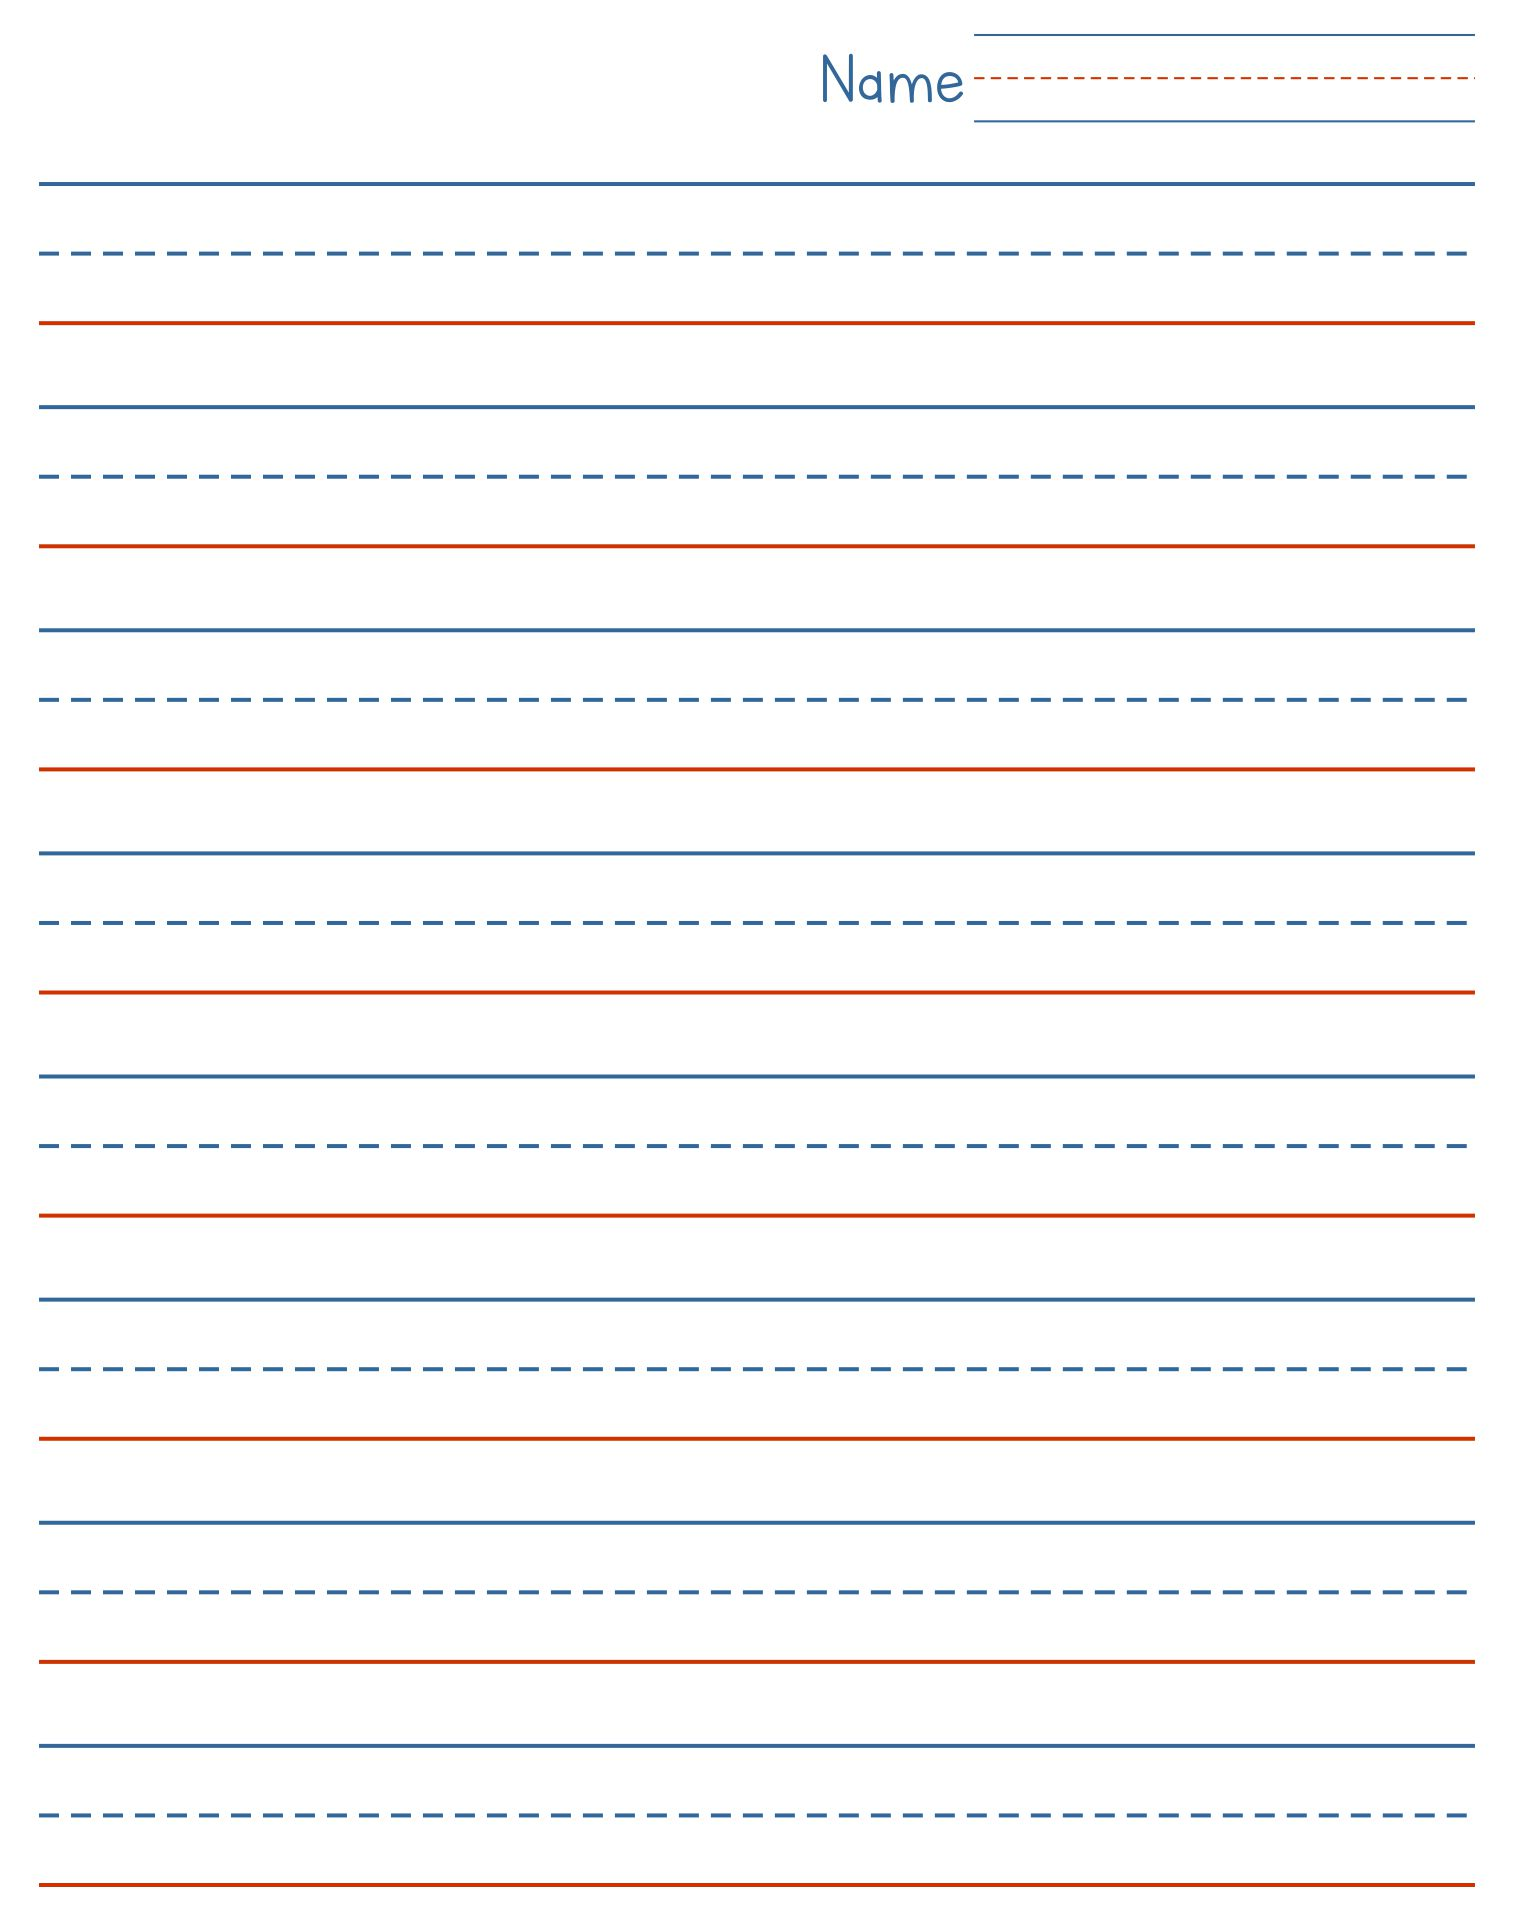 Free Worksheets handwriting worksheets pdf Handwriting – Cursive Writing Worksheets Pdf